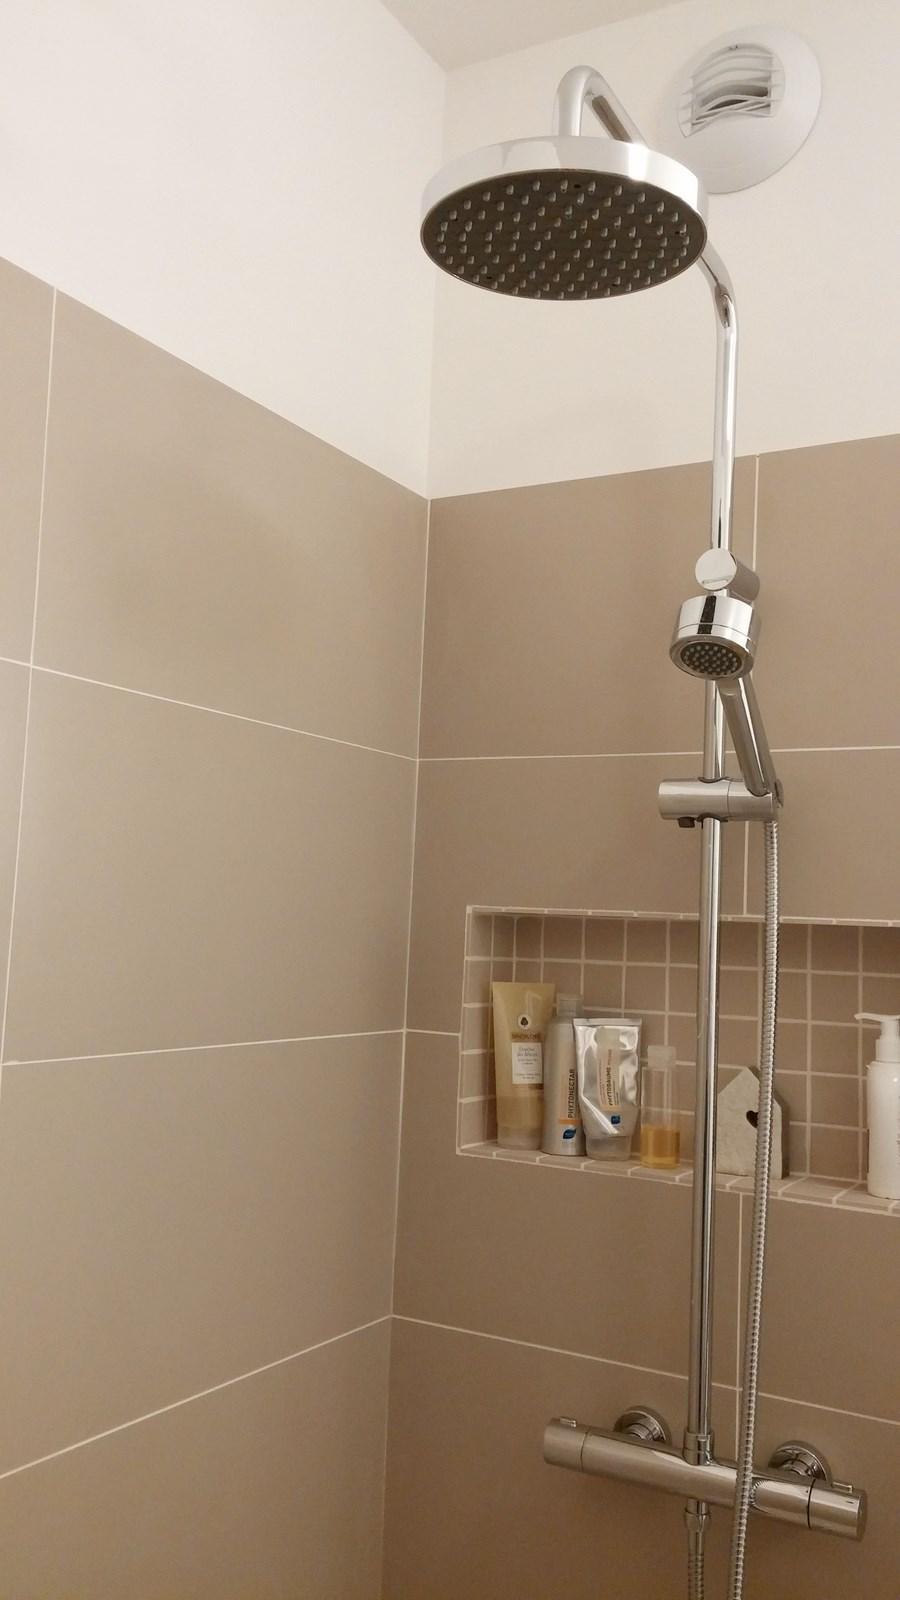 sdb asni res niche dans la douche. Black Bedroom Furniture Sets. Home Design Ideas